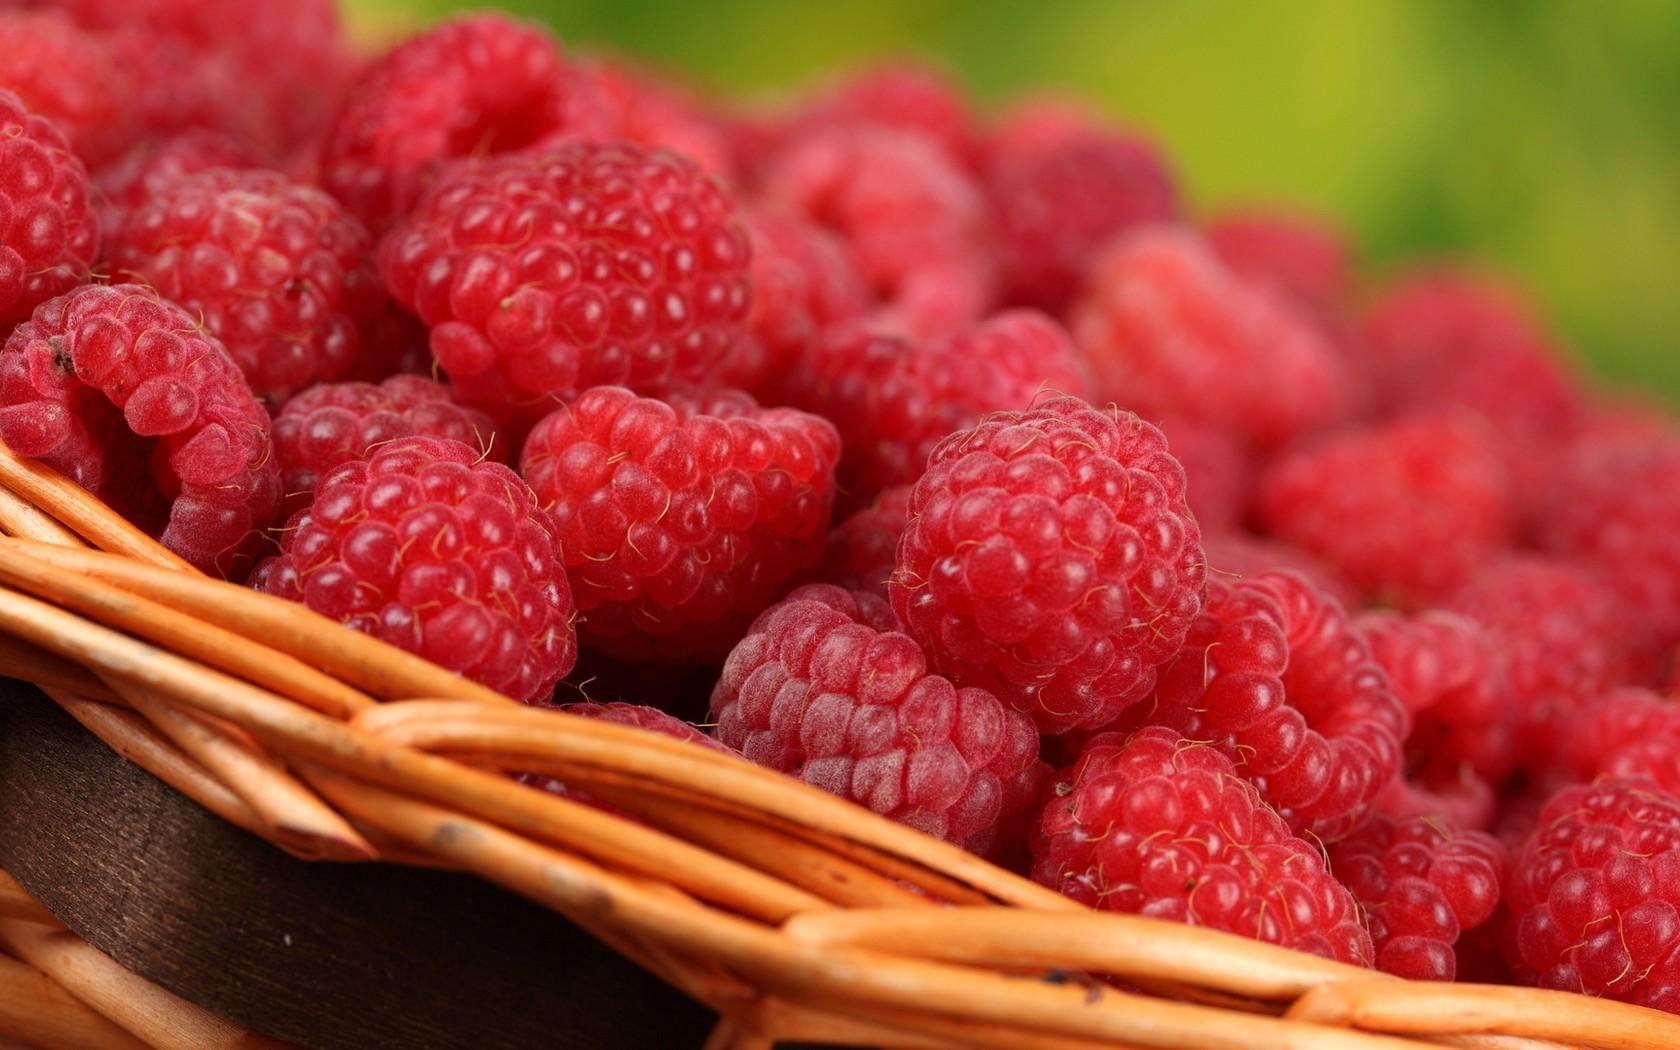 Fruta Frambuesas - 1680x1050